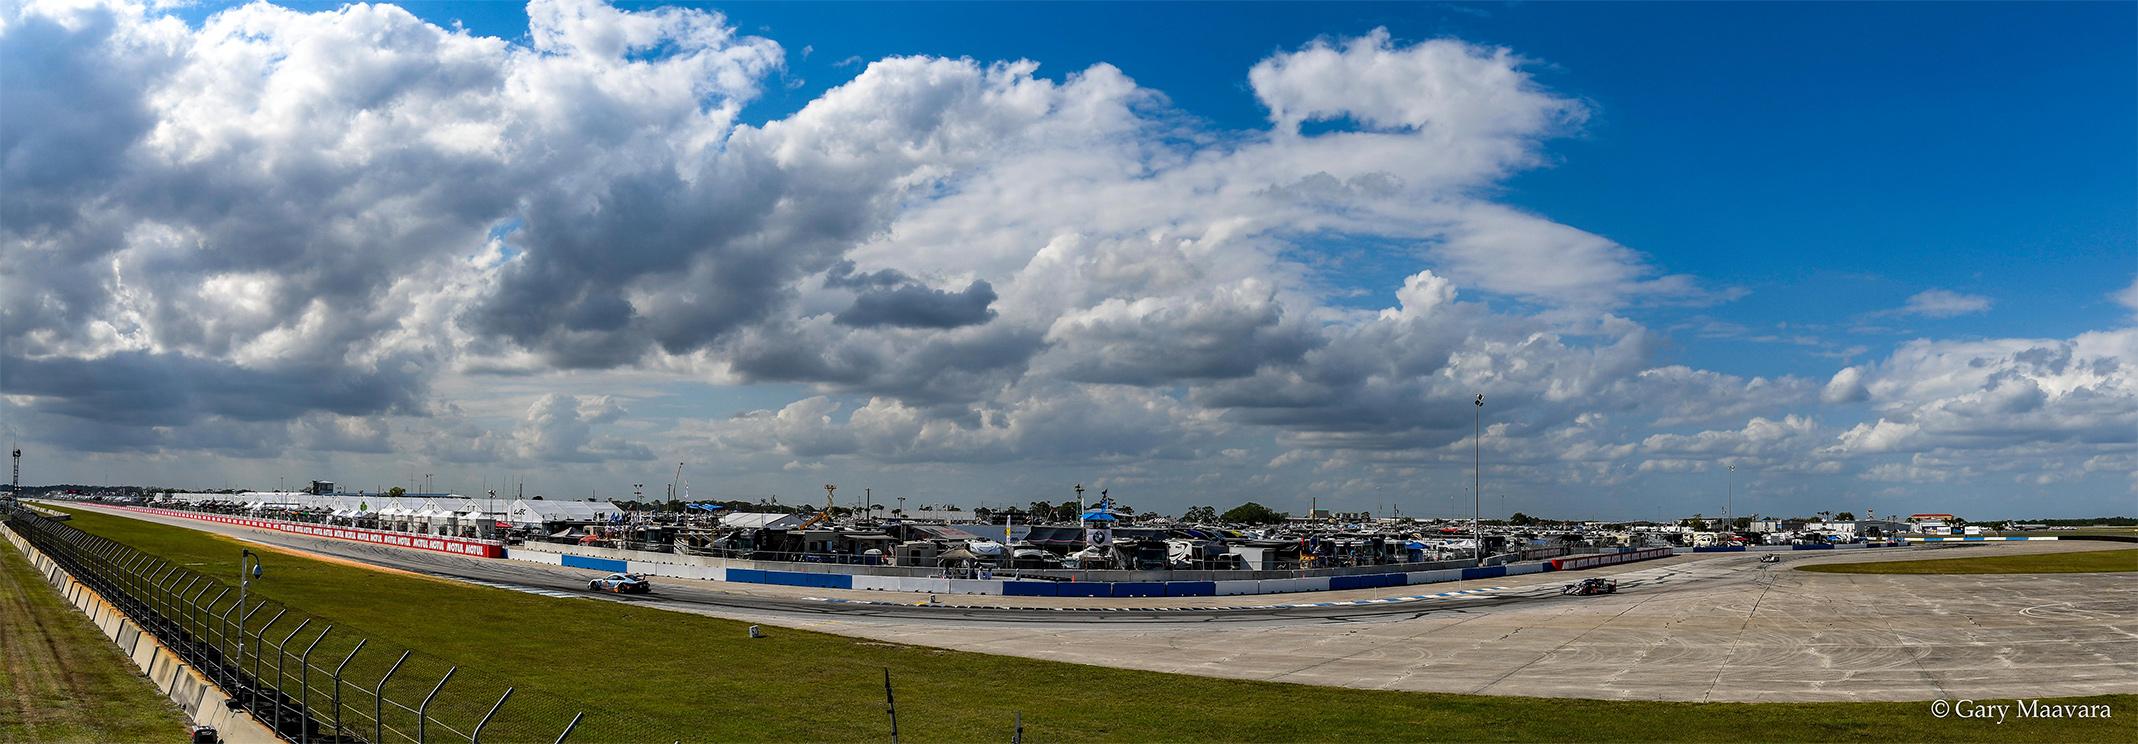 TrackWorthy - WEC_race_turns 15-16-Ulmann panorama